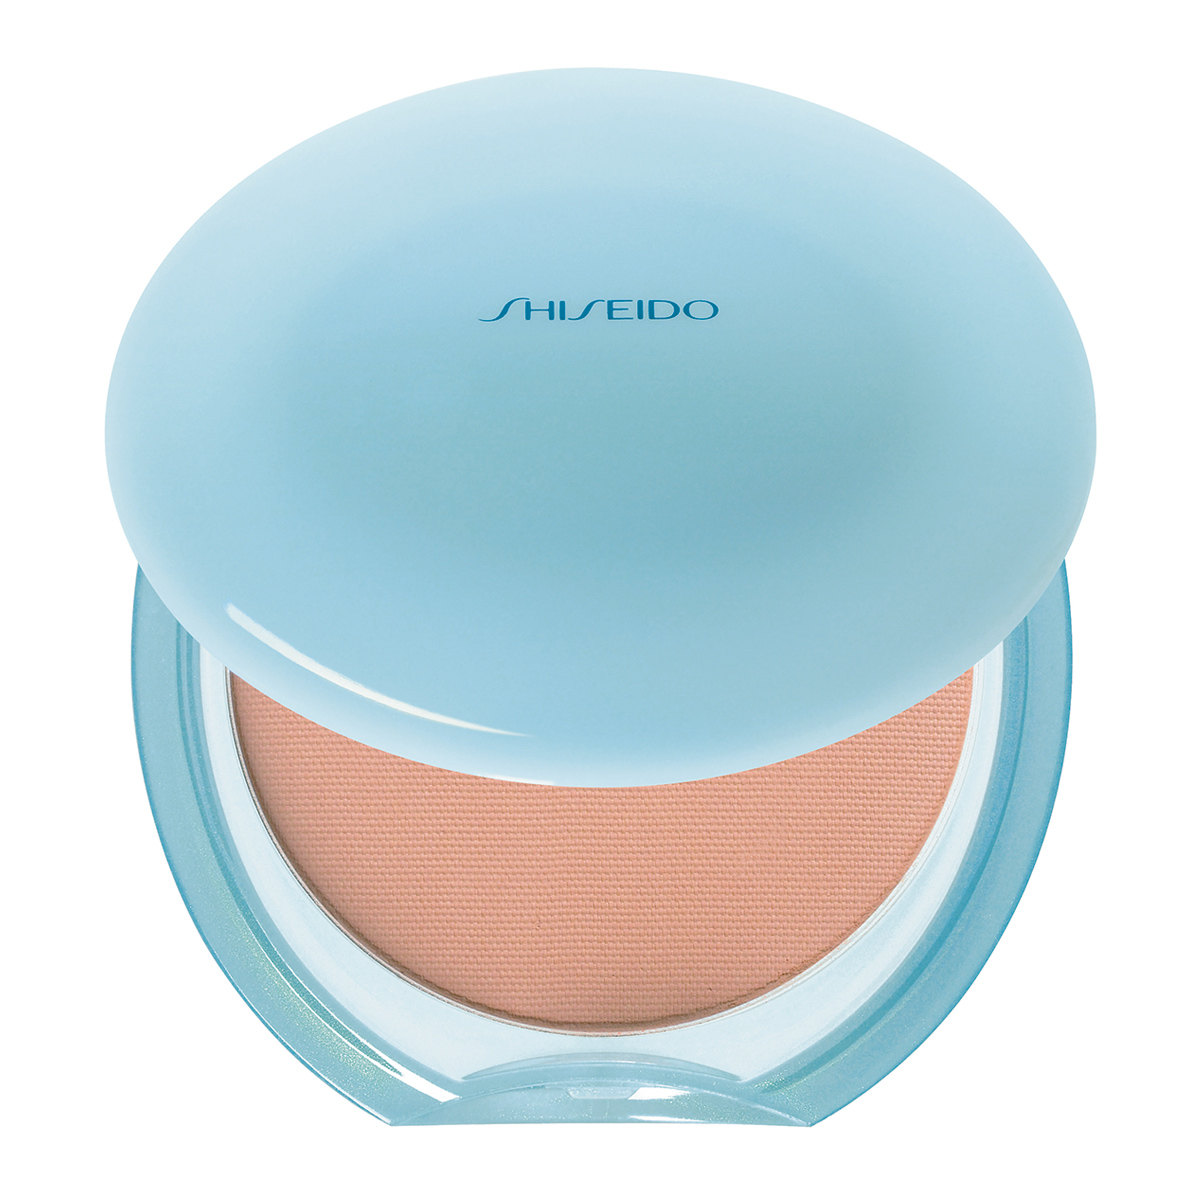 Shiseido - Pureness - Compact Teinté Matifiant